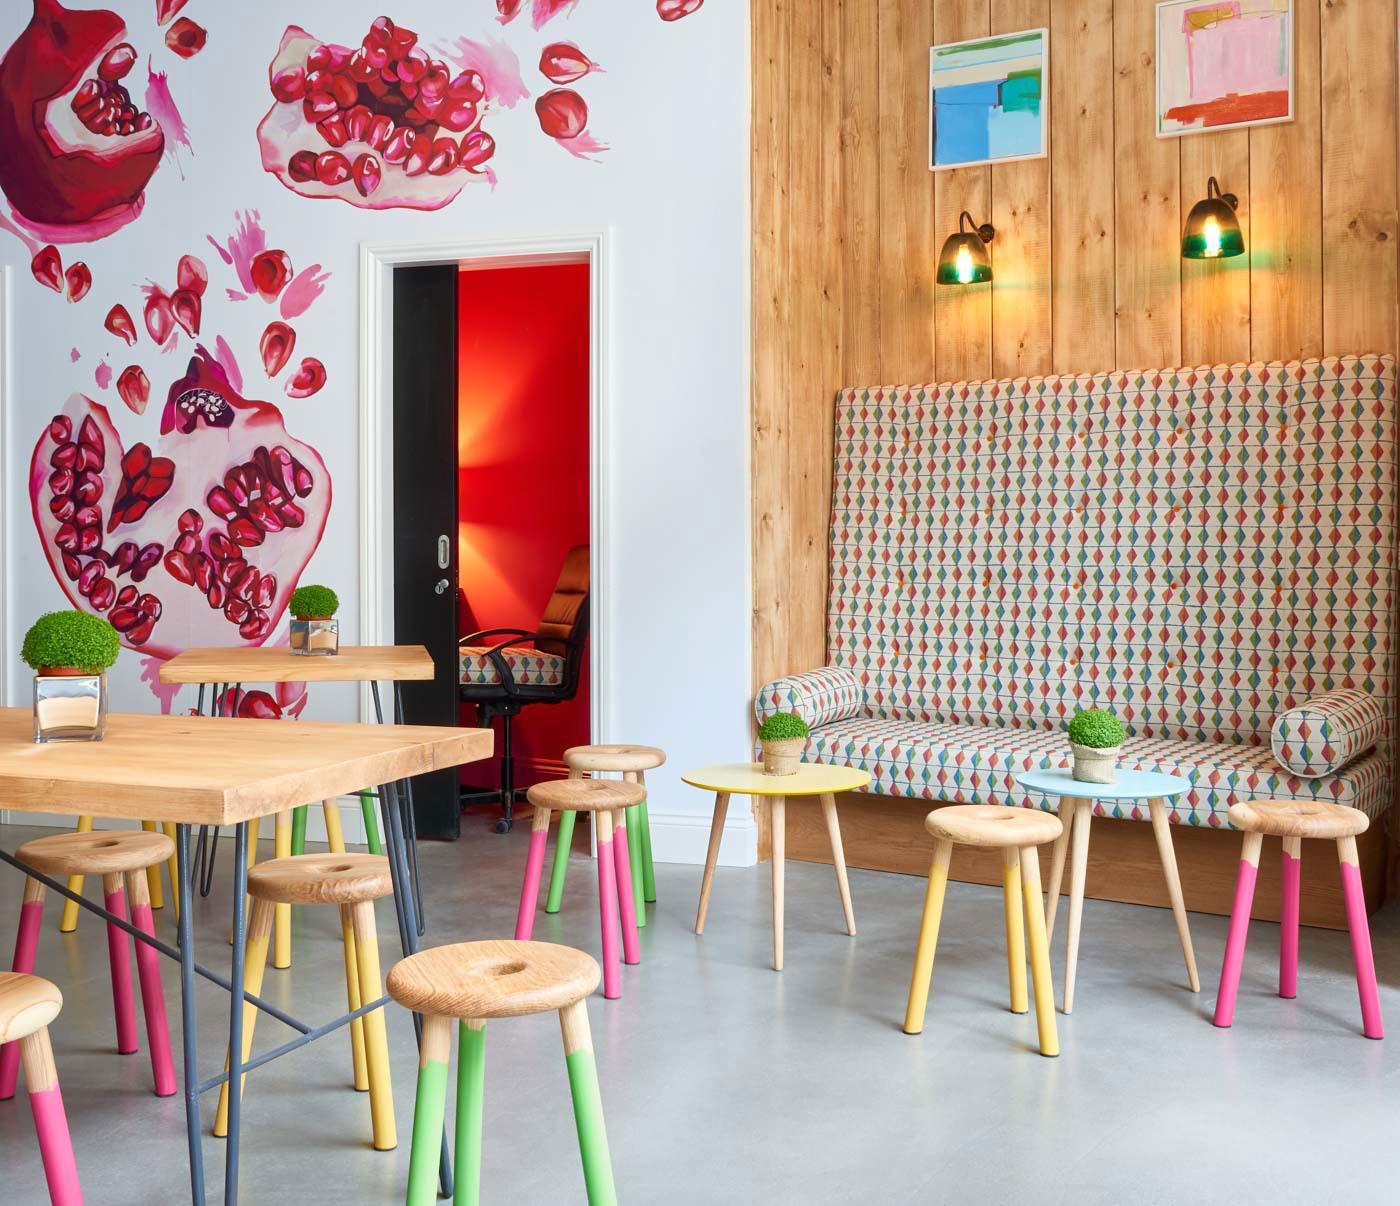 kaboola-kitchen-colourful-sofa-sarah-fortescue-design.jpg